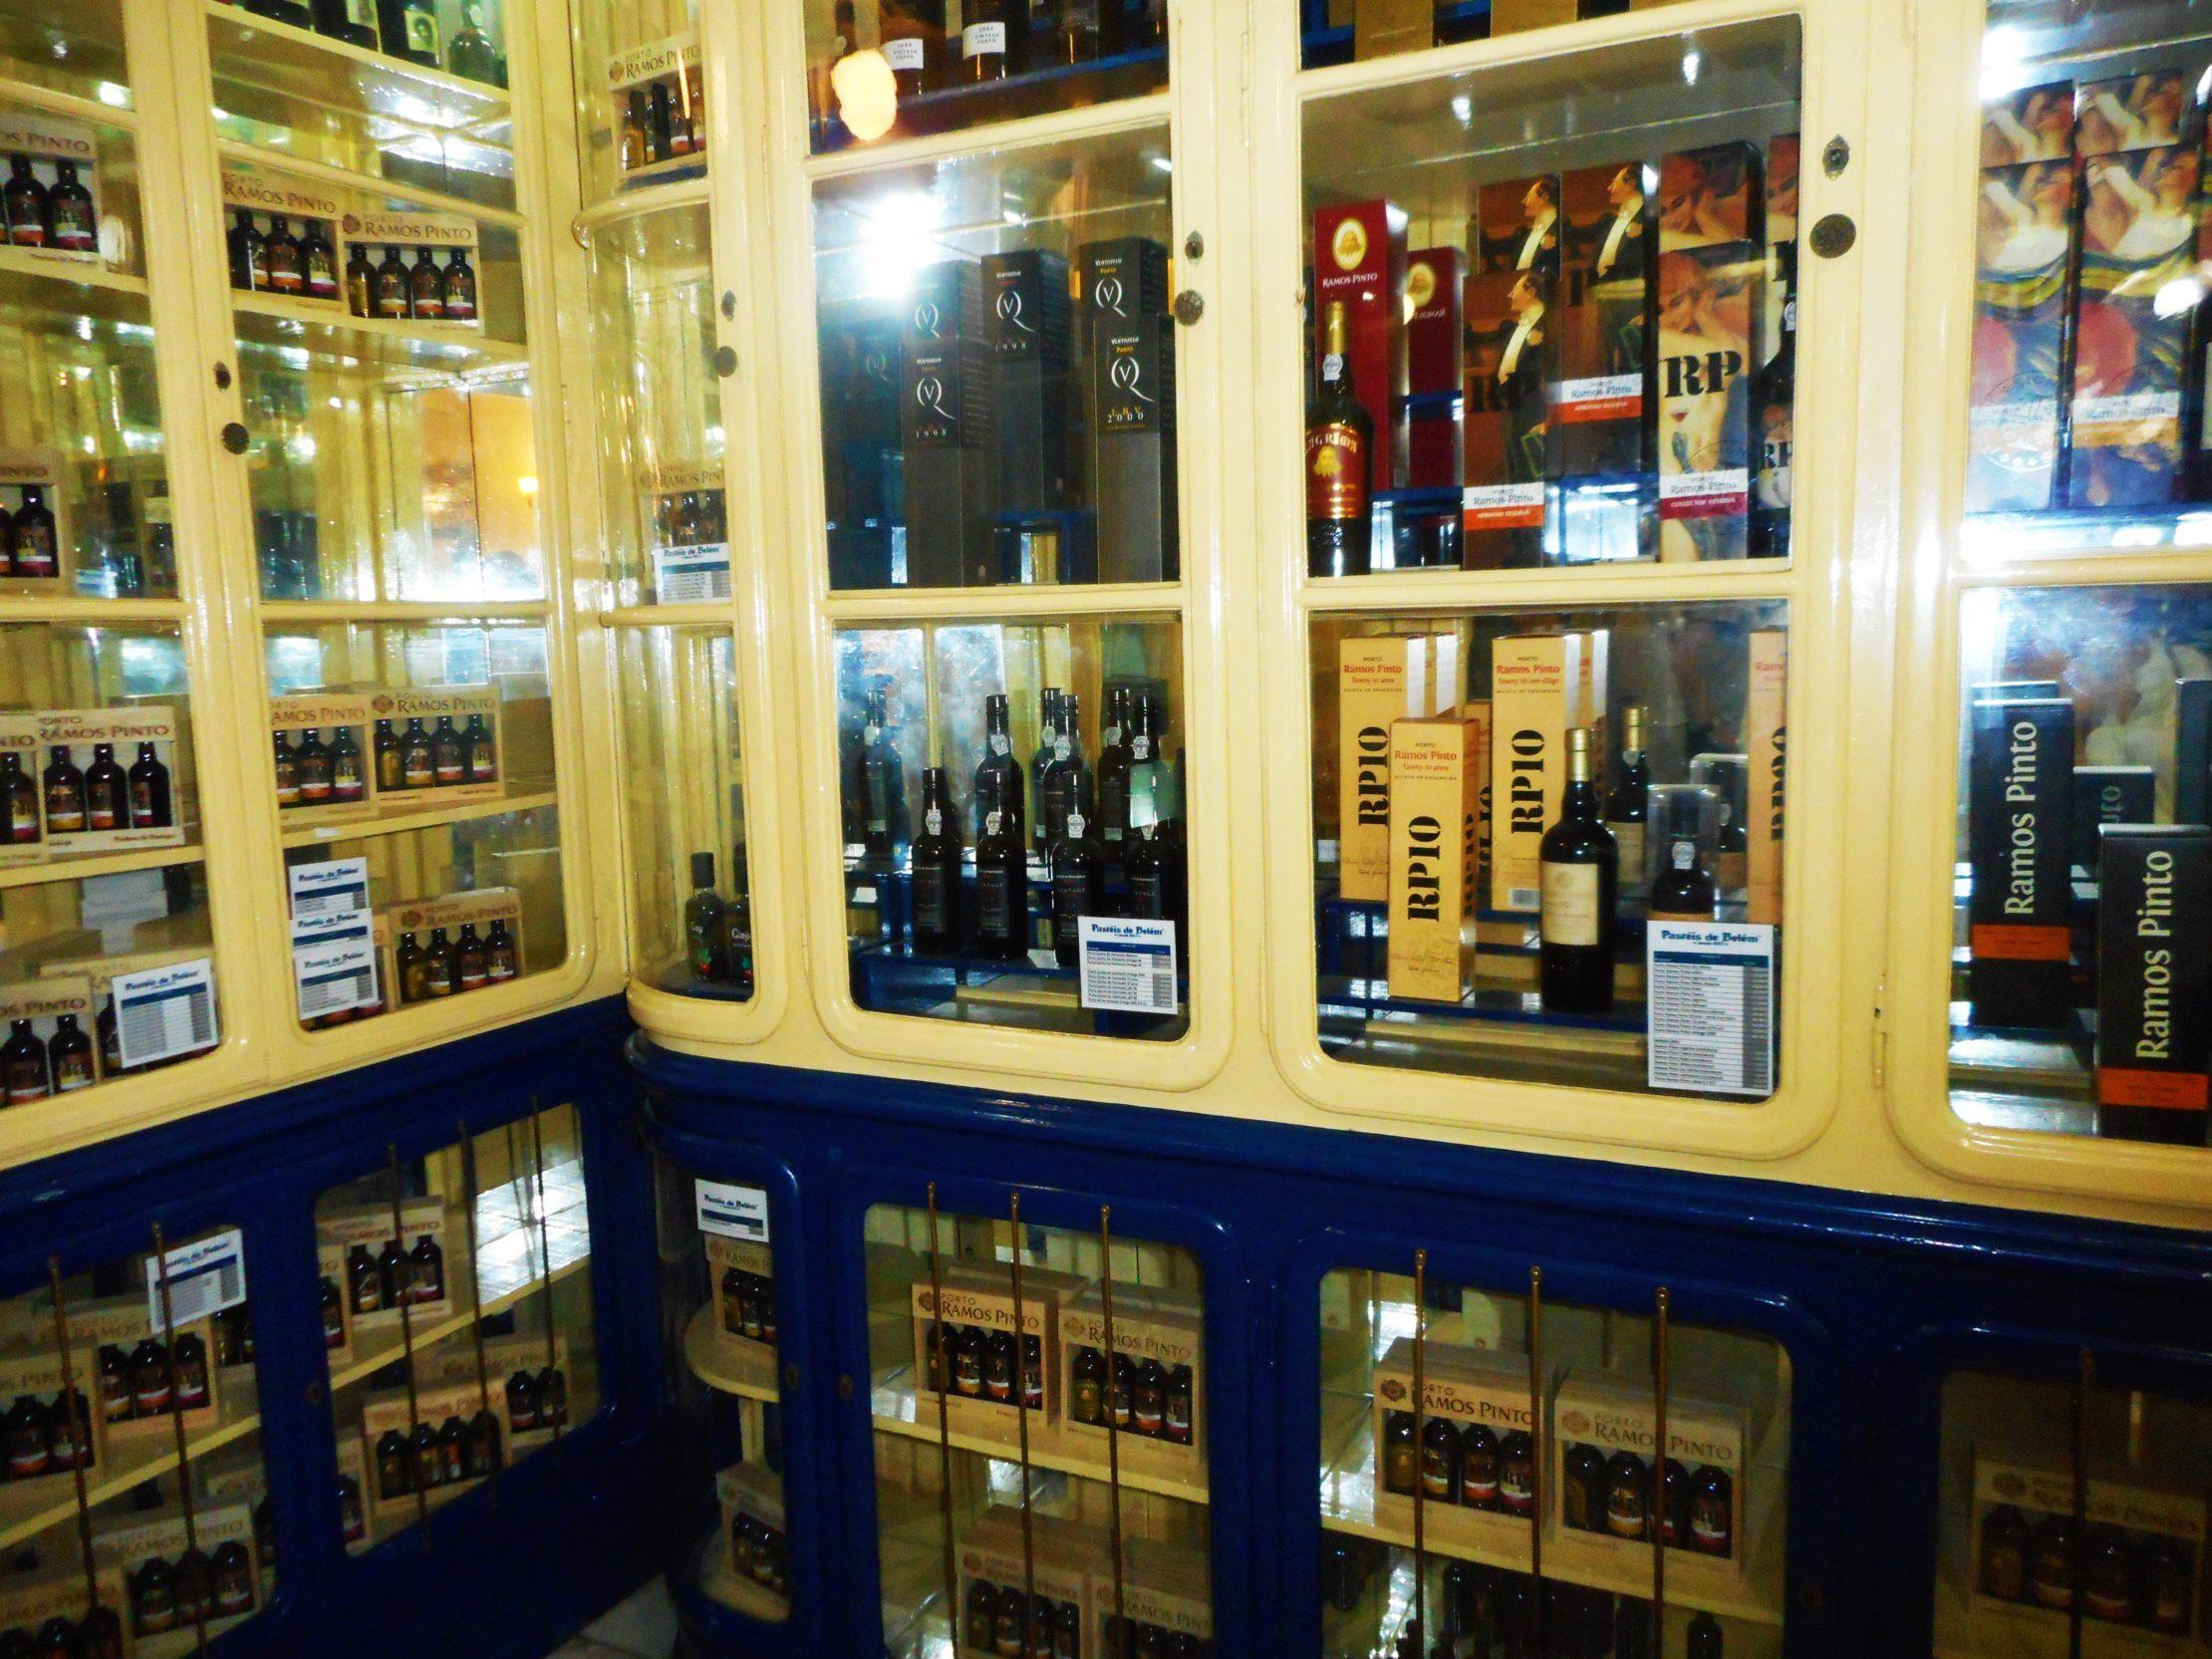 Selección de vinos de Oporto en Lisboa